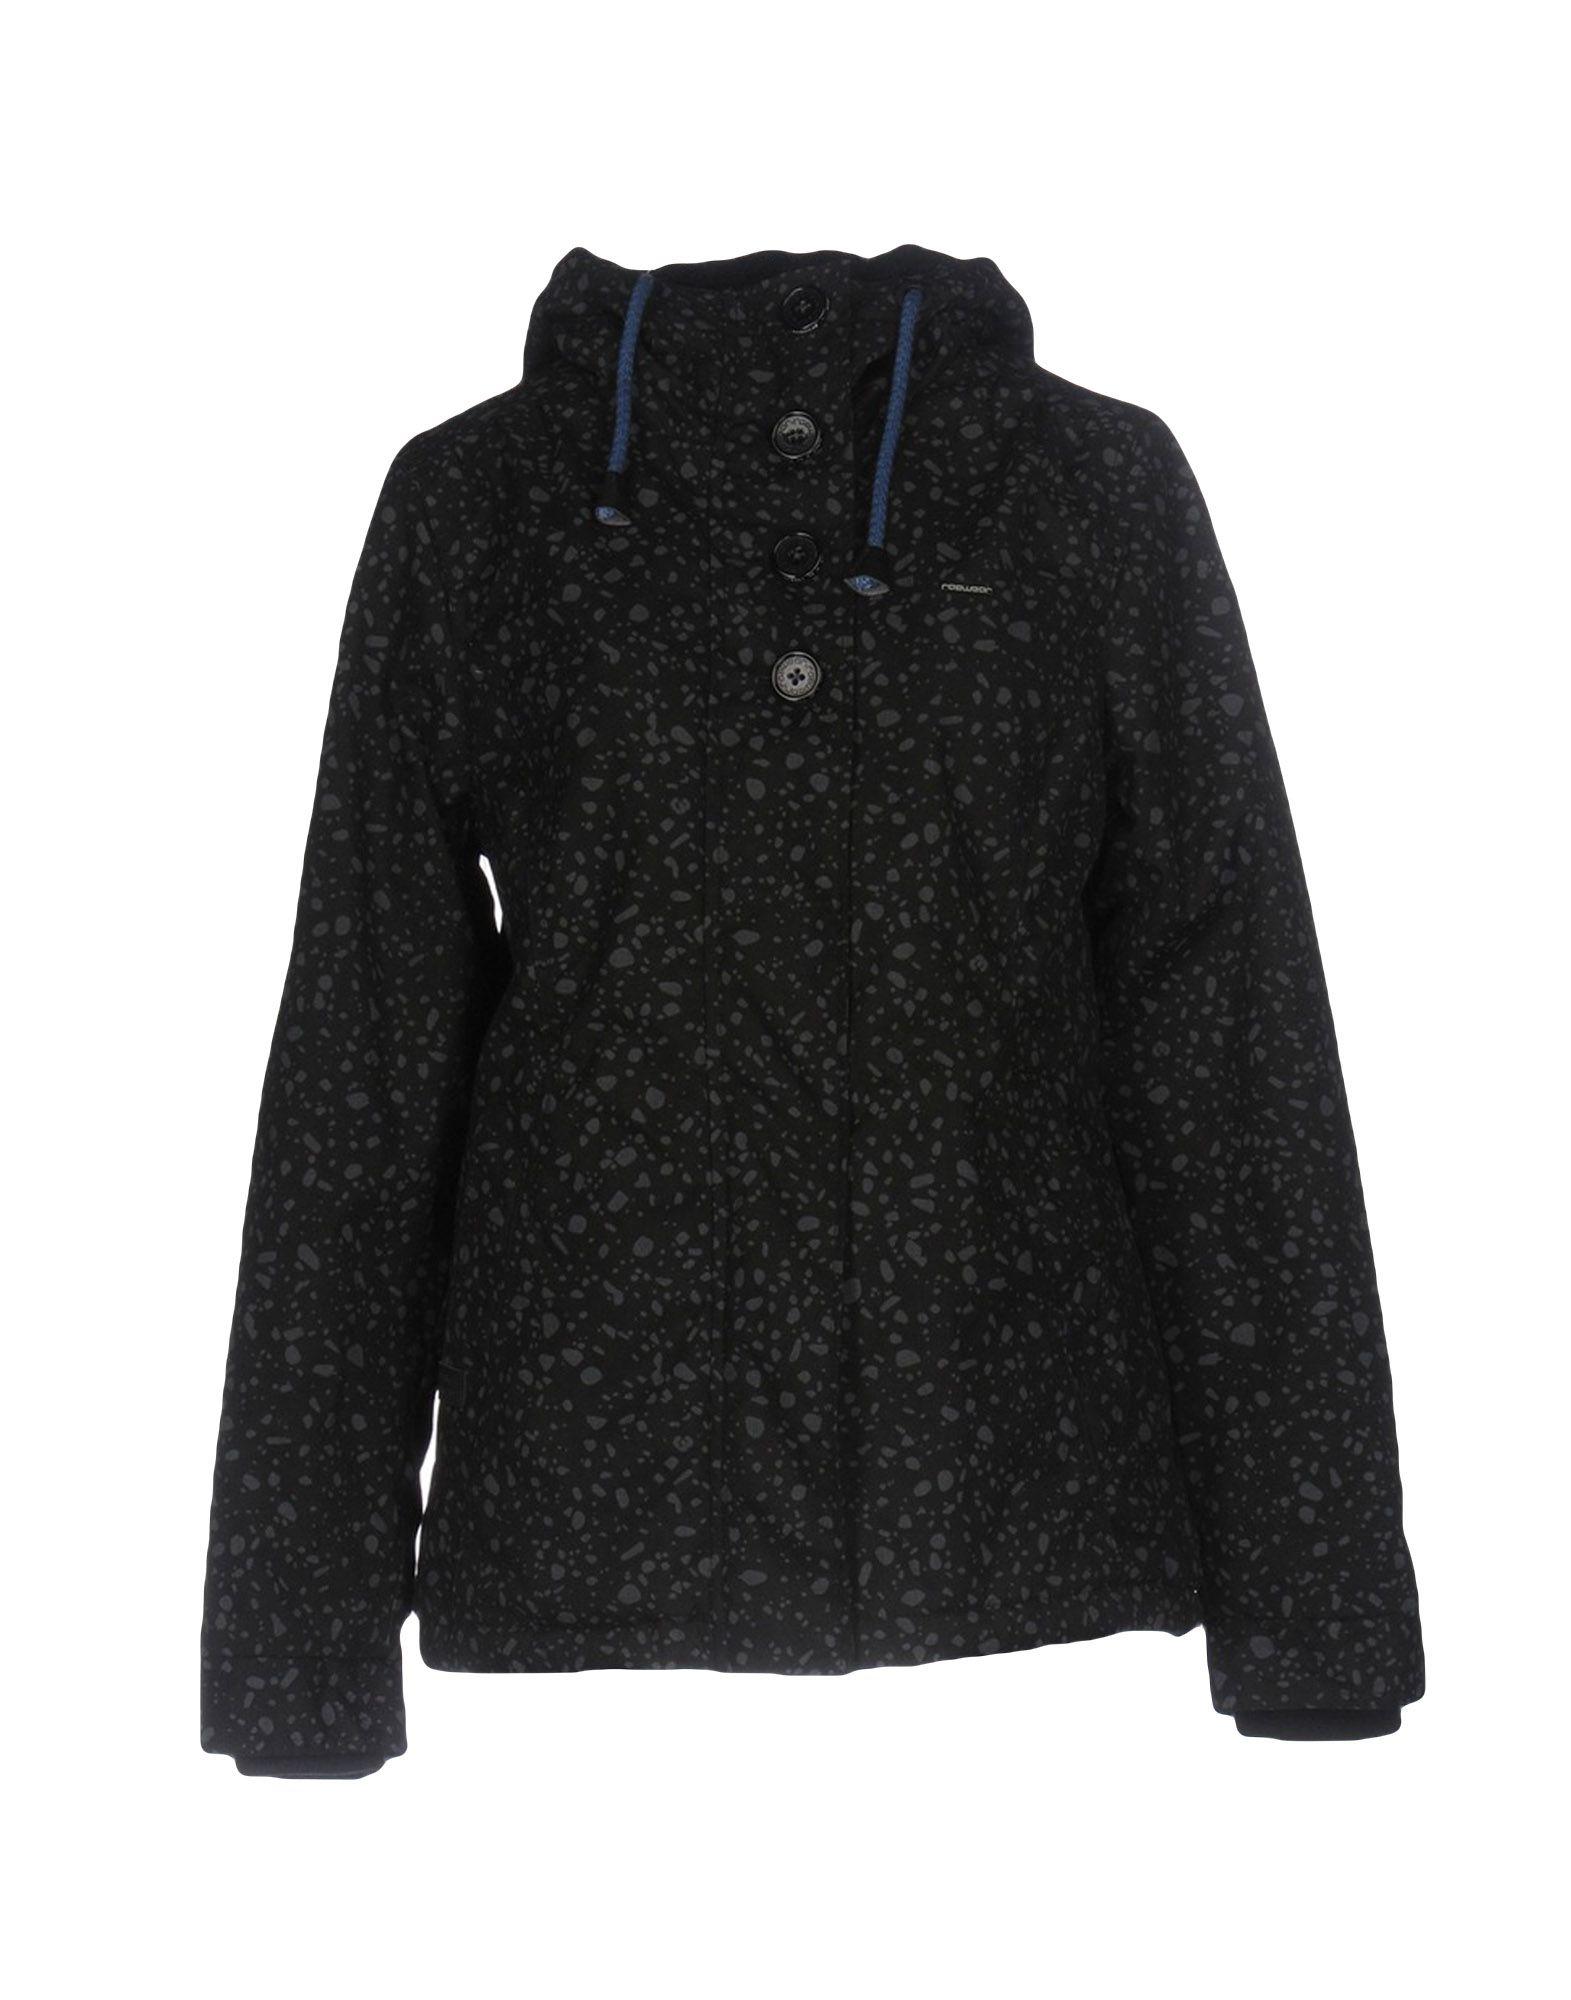 RAGWEAR Damen Jacke Farbe Schwarz Größe 5